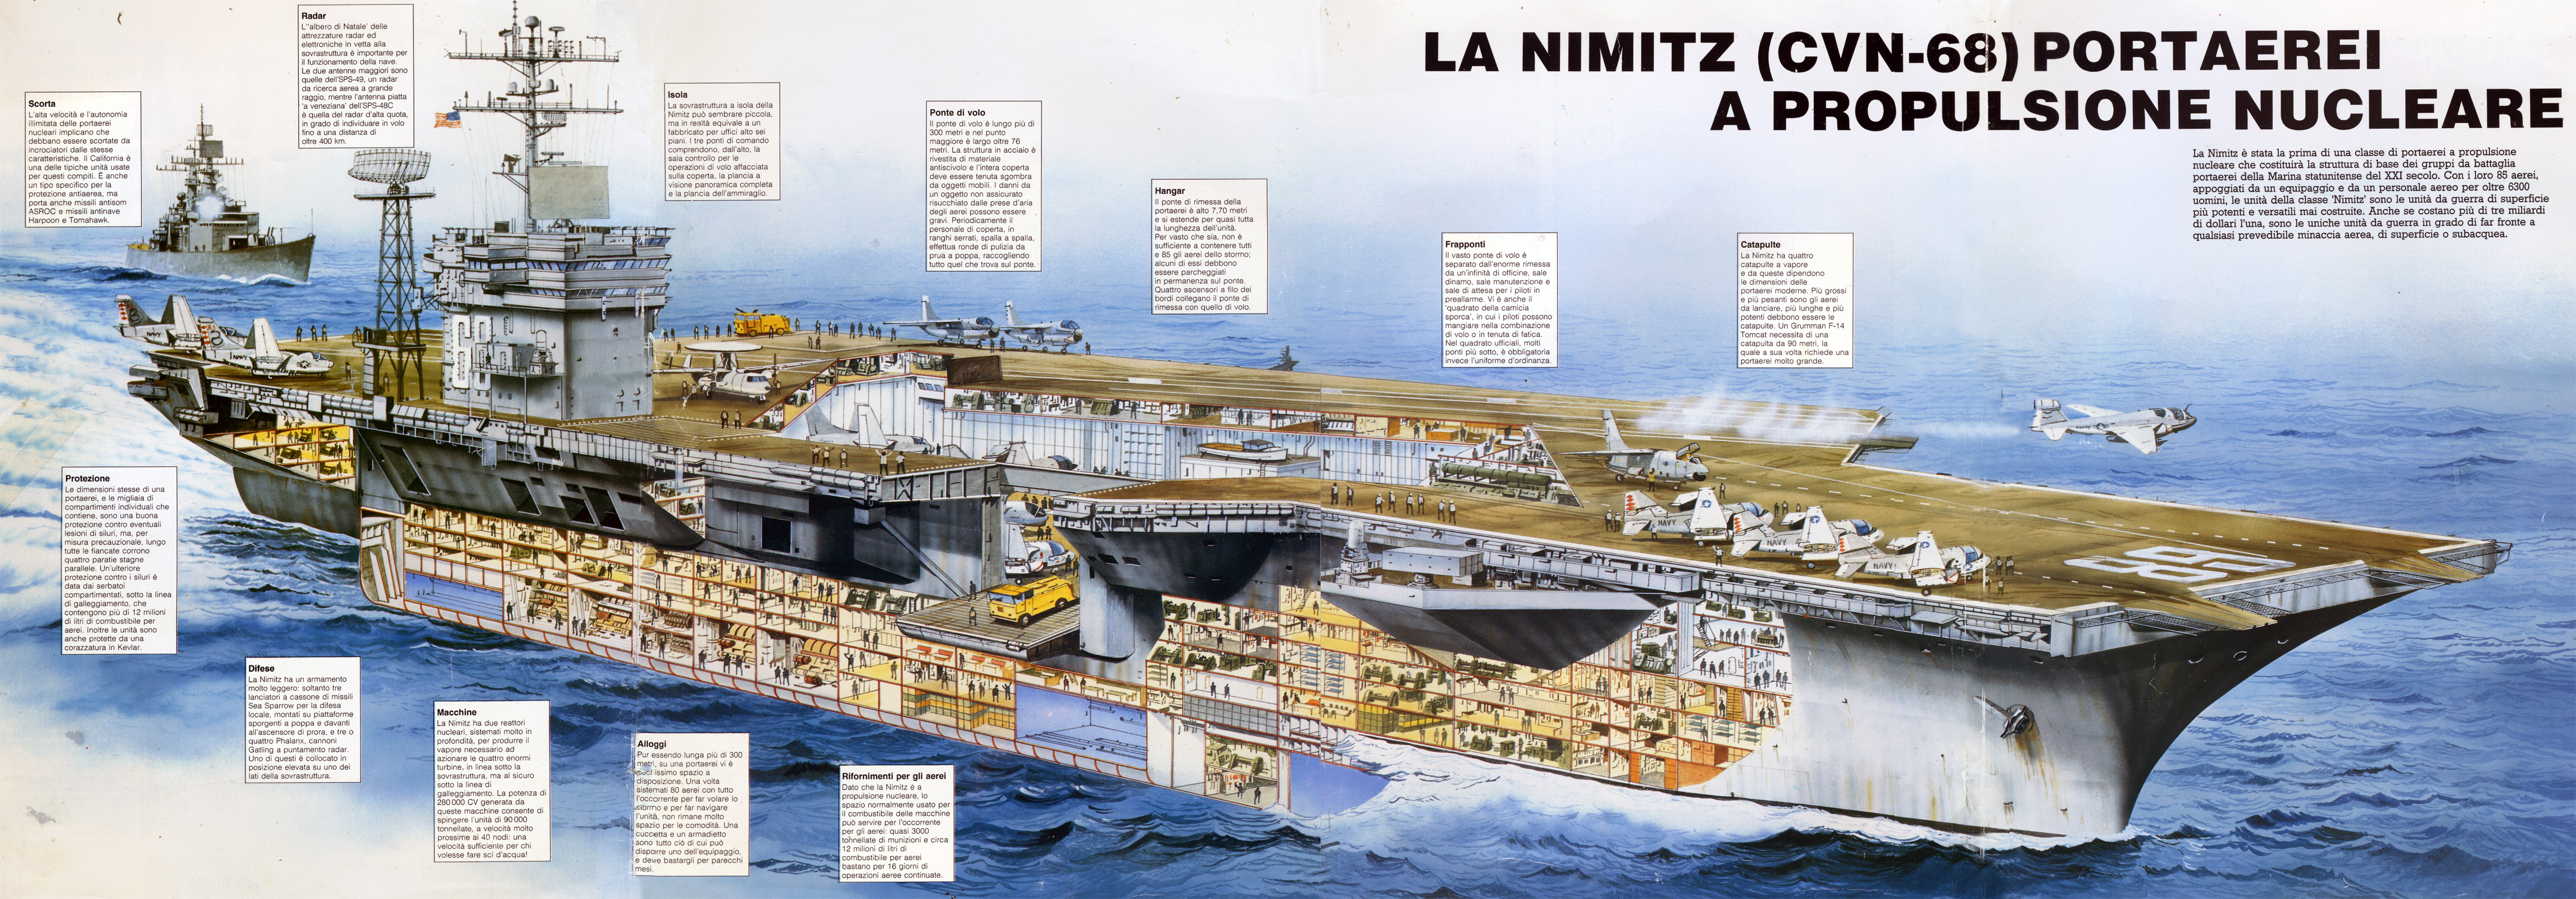 aircraft carrier diagram subaru wiring diagrams cutaway drawing diagramas em 3d de maquinas mostrando